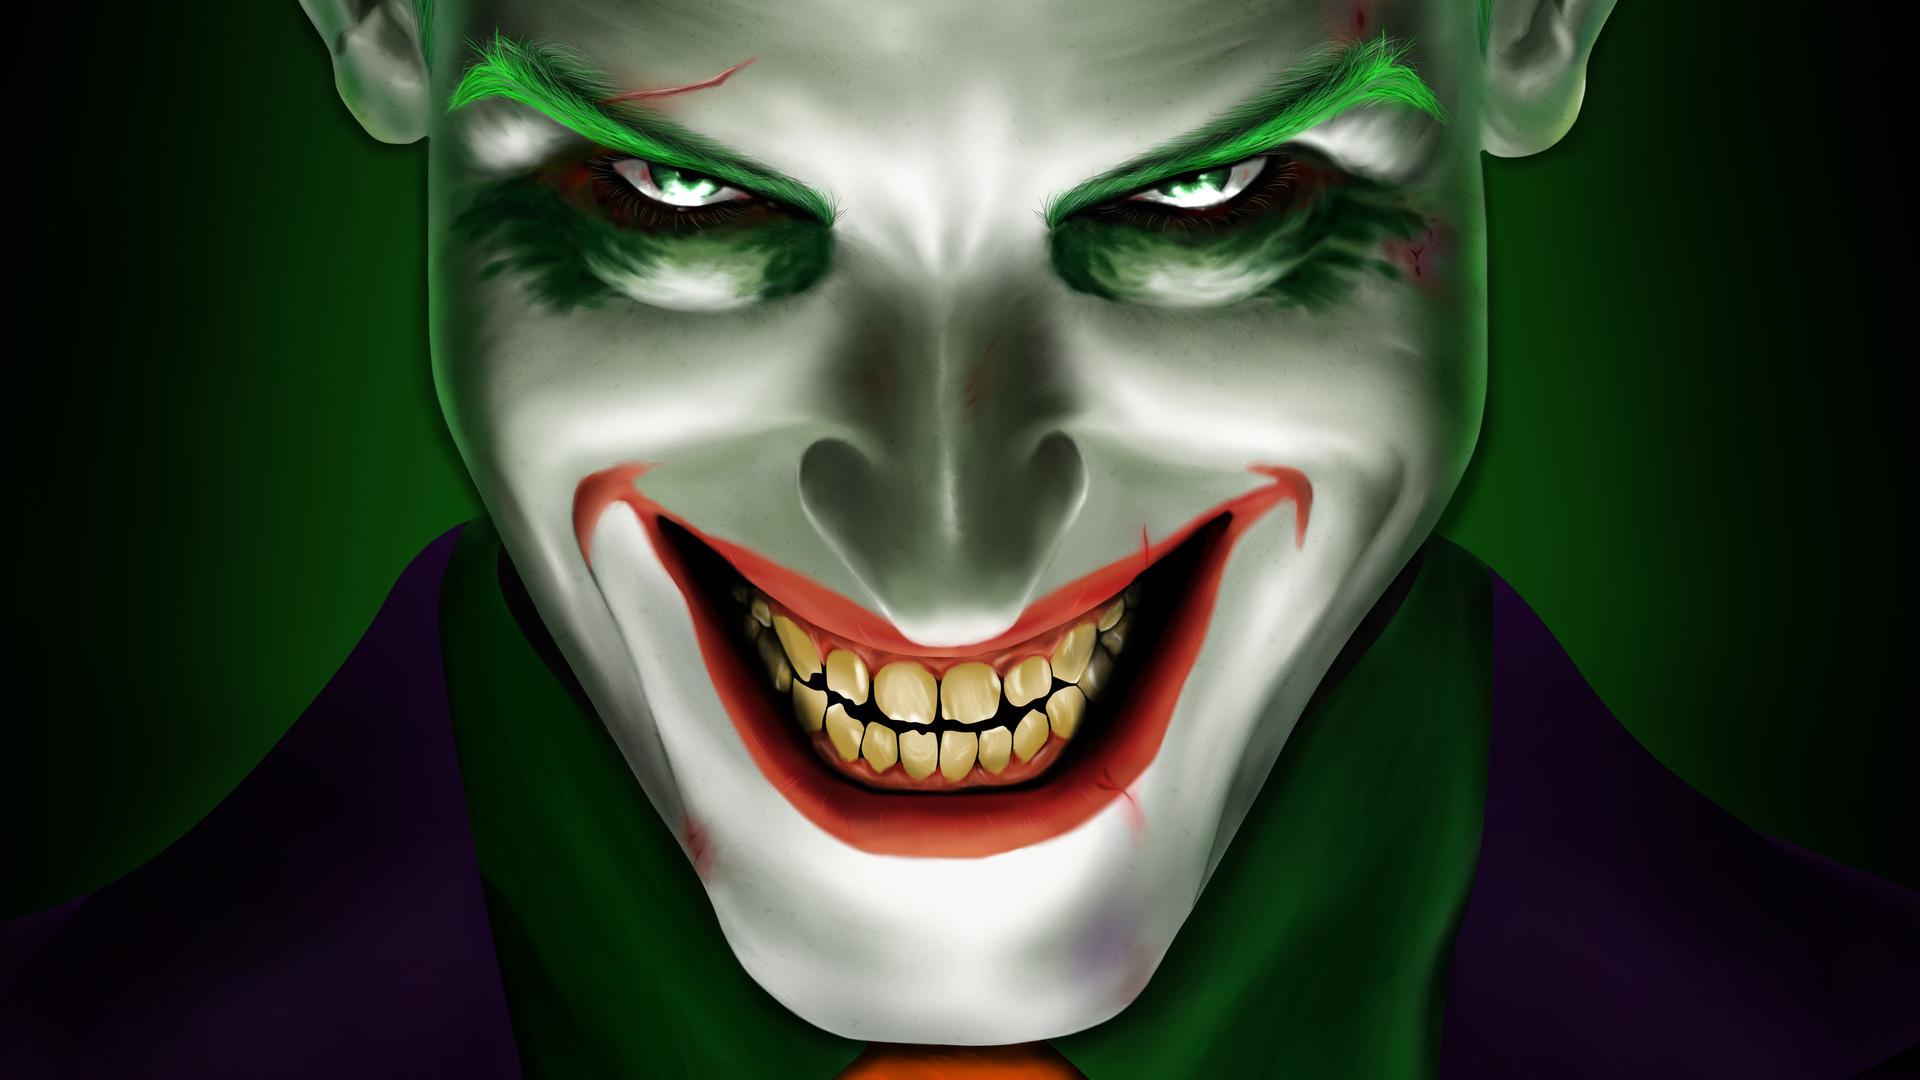 1920x1080 Joker Smiling 5k Laptop Full HD 1080P HD 4k ...